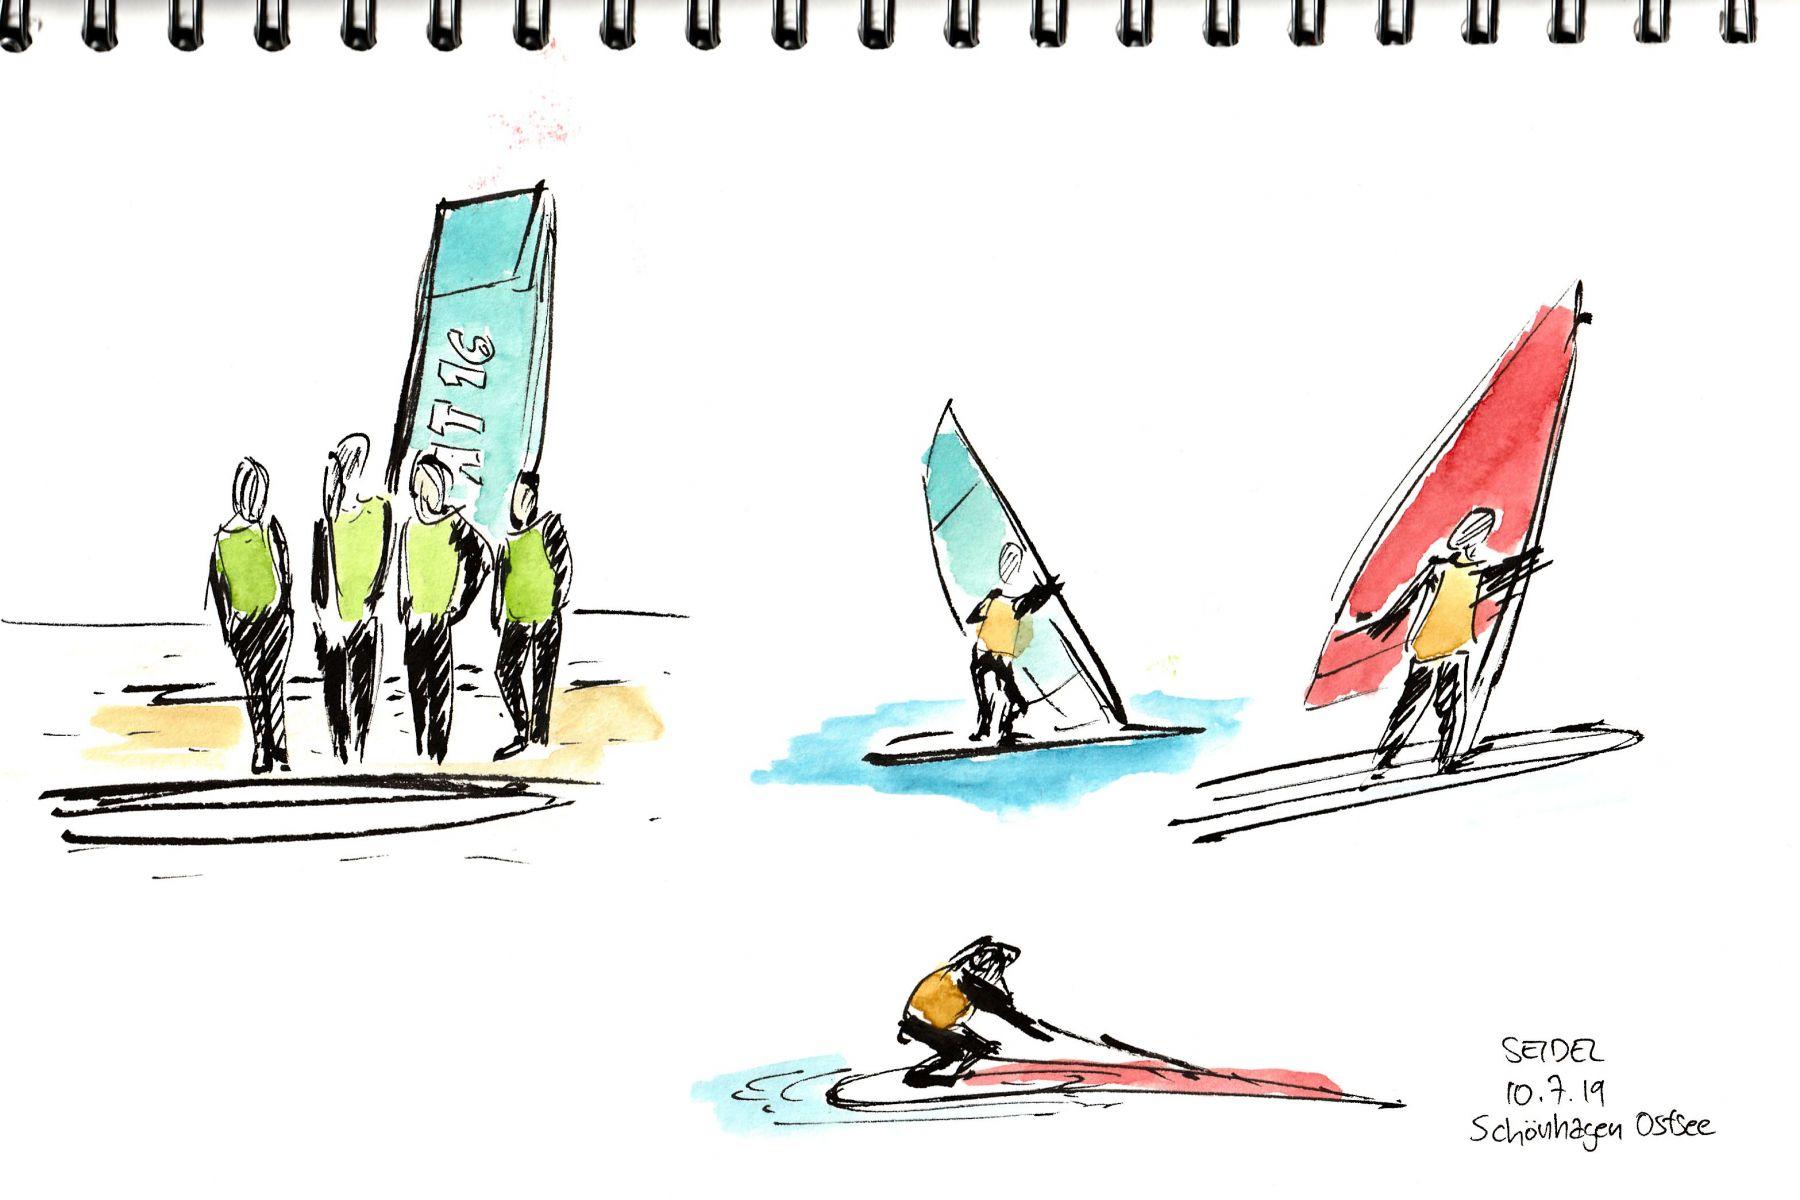 Ostsee-windsurfer